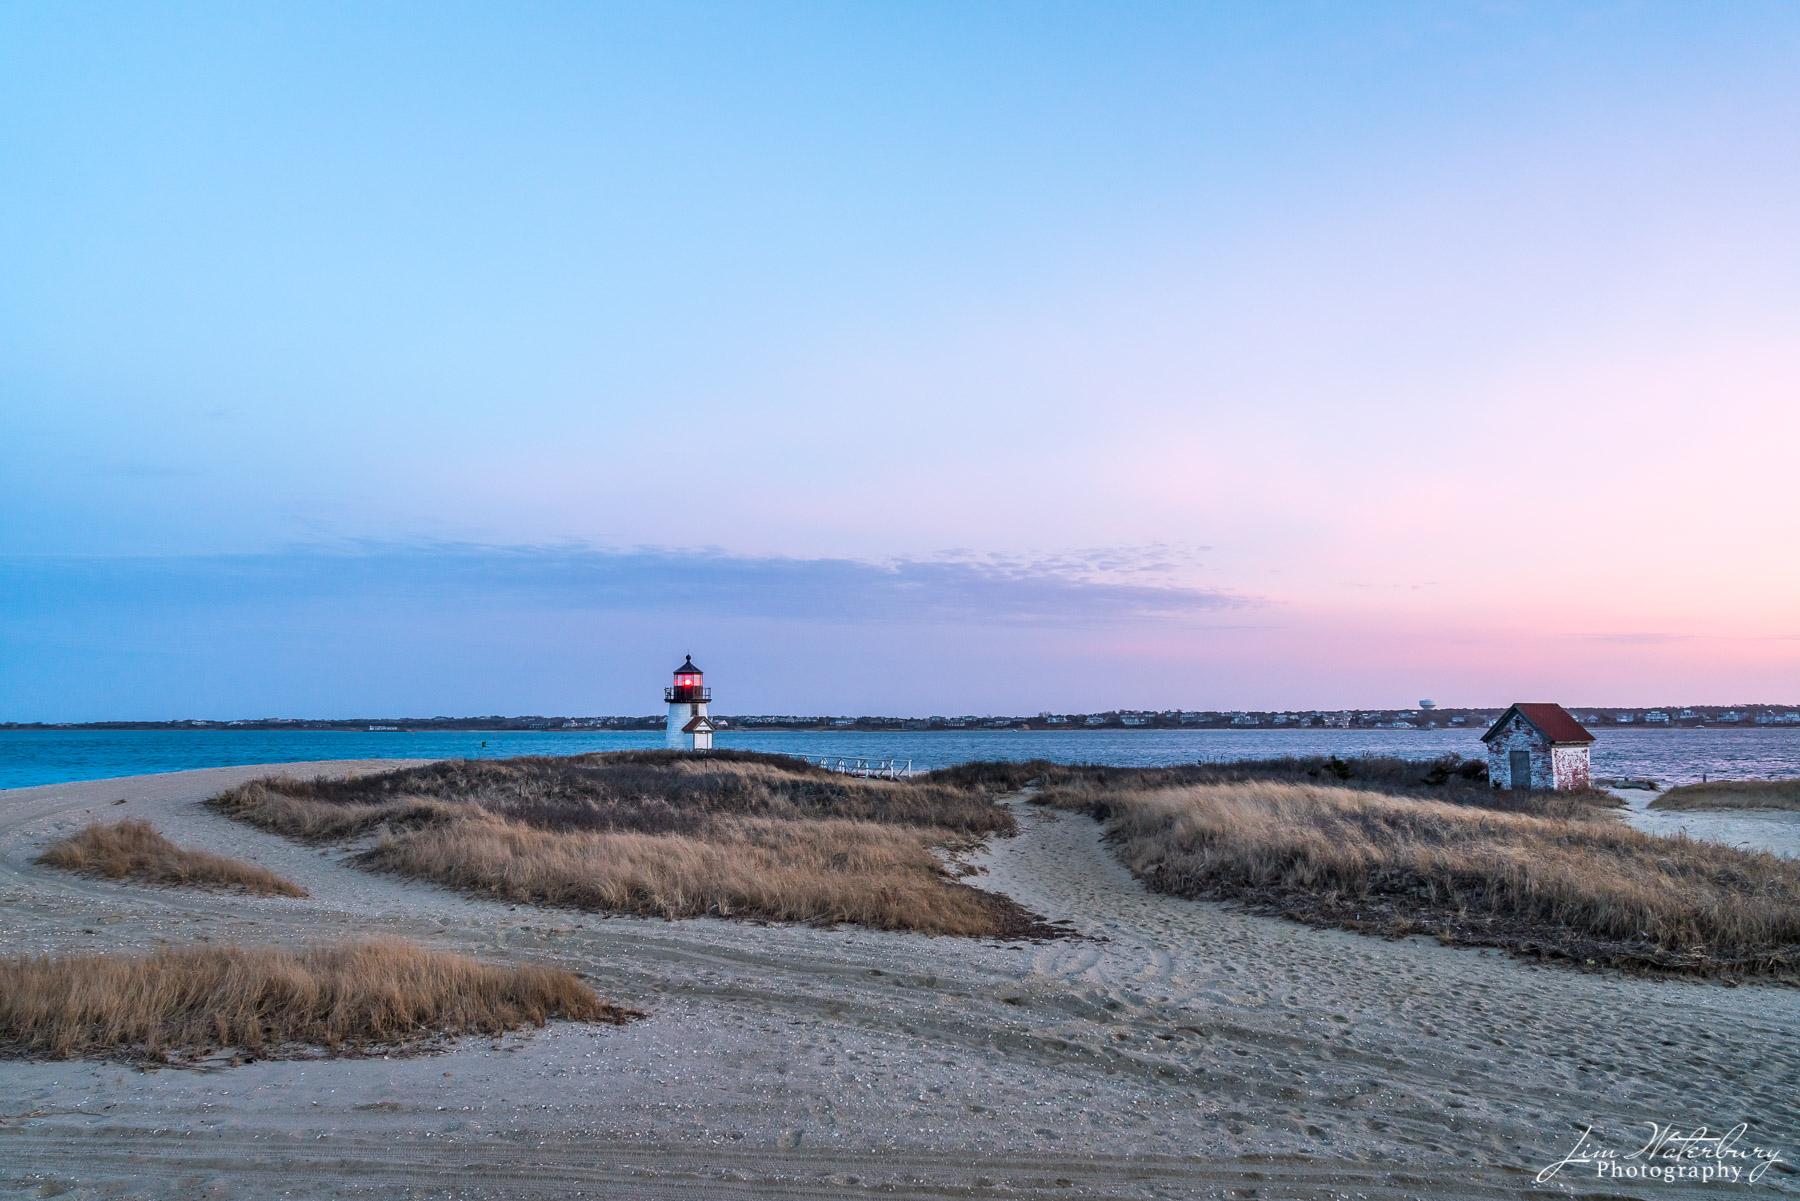 Brant Point, lighthouse, Nantucket, sunrise, photo